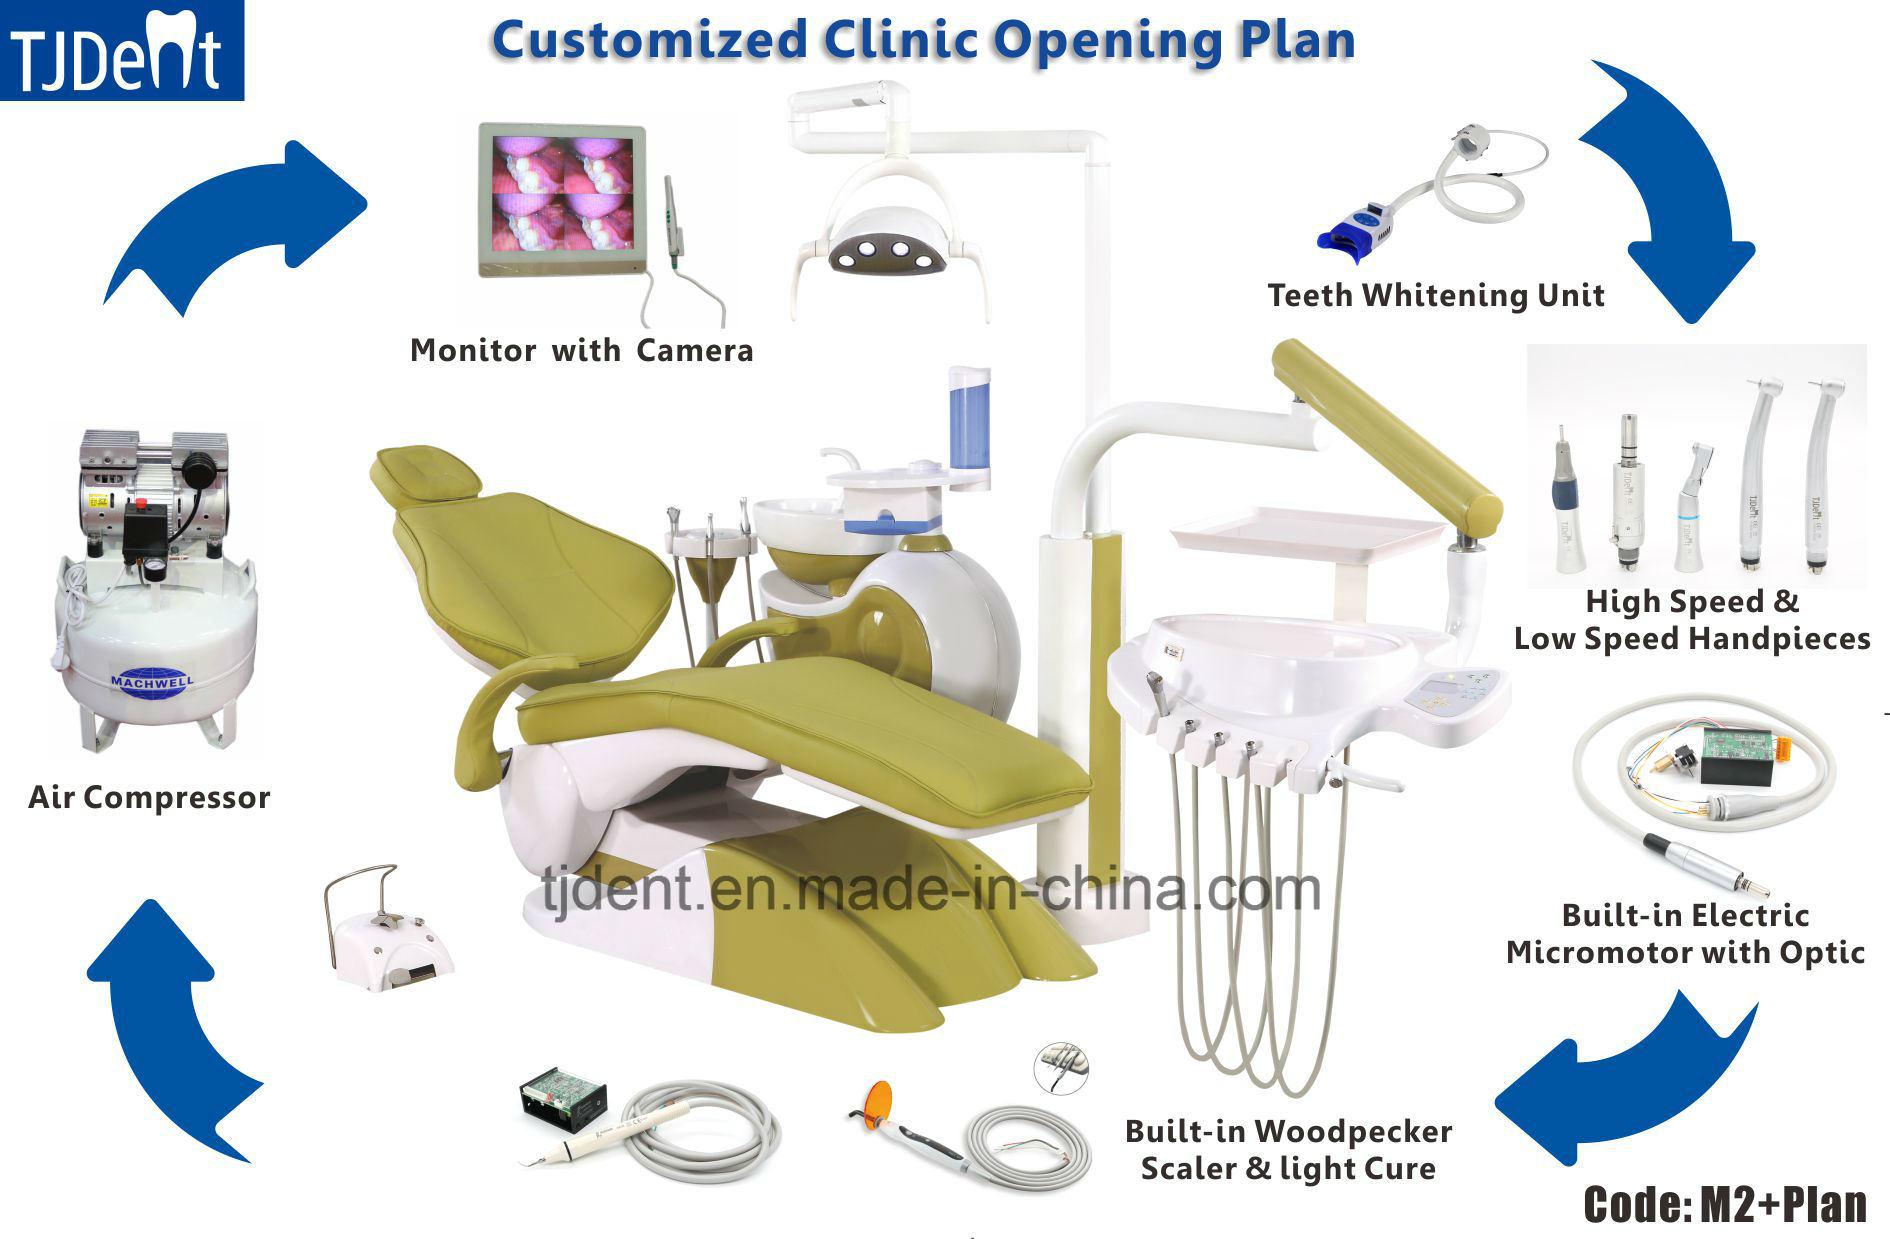 German Steady & Secure Dental Unit Clinic Opening Plan (M2+Plan)